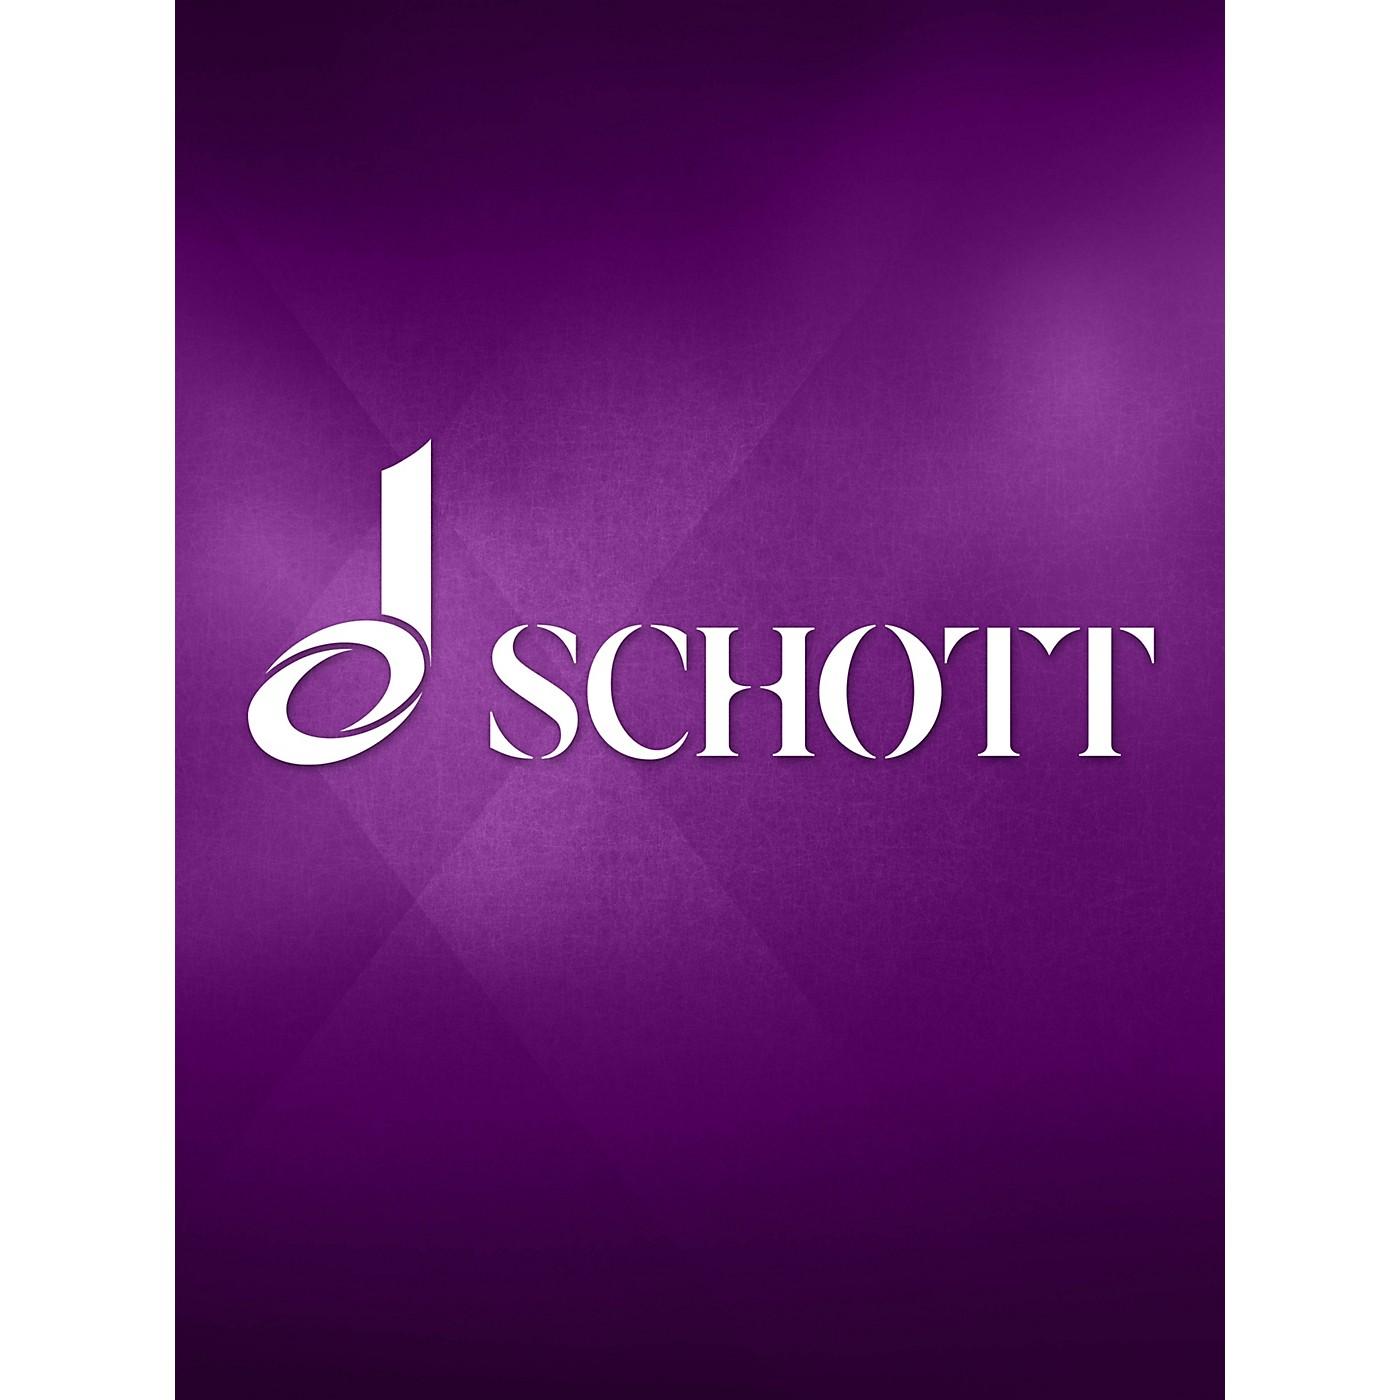 Schott Aribert Reimann (Leben und Werk (German Text)) Schott Series thumbnail